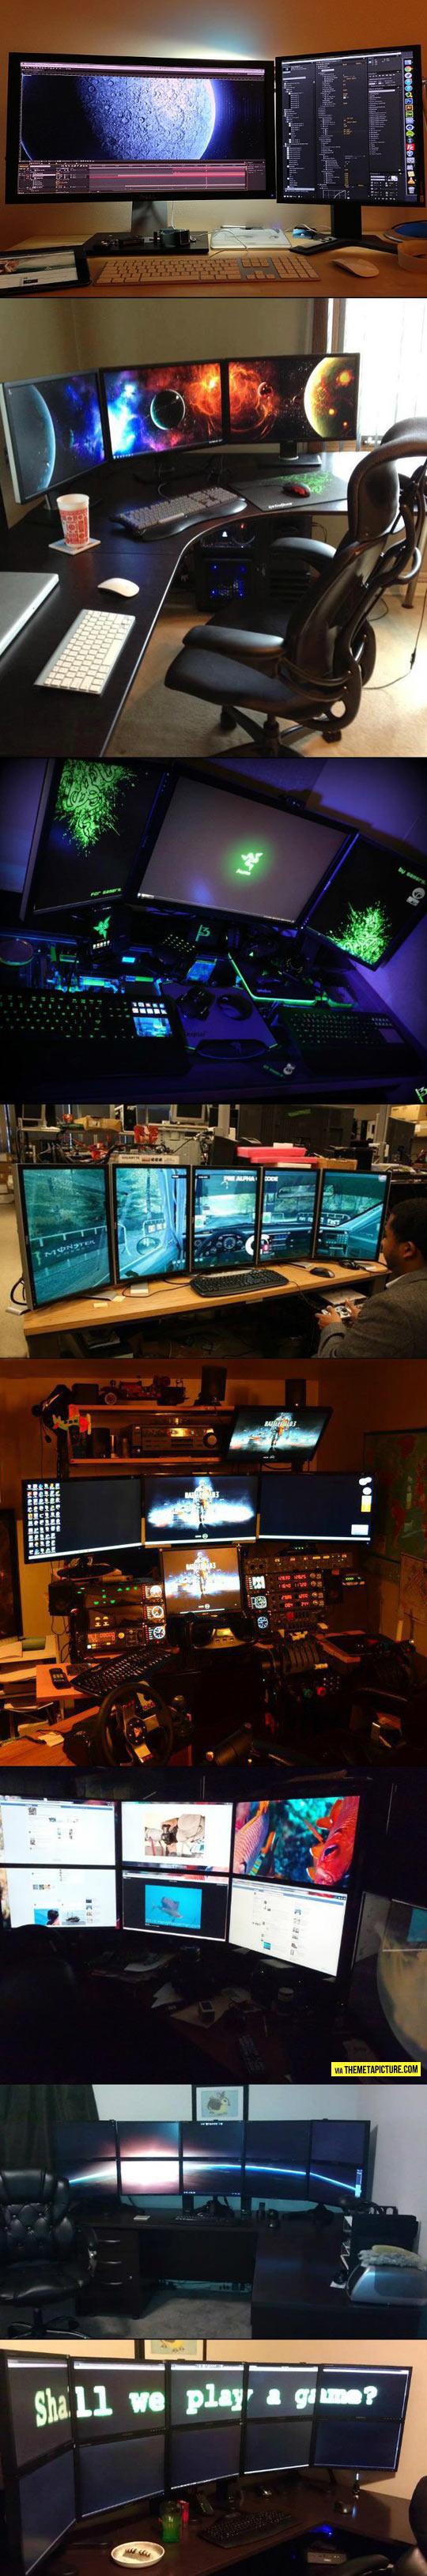 DIY-screen-video-games-resolution